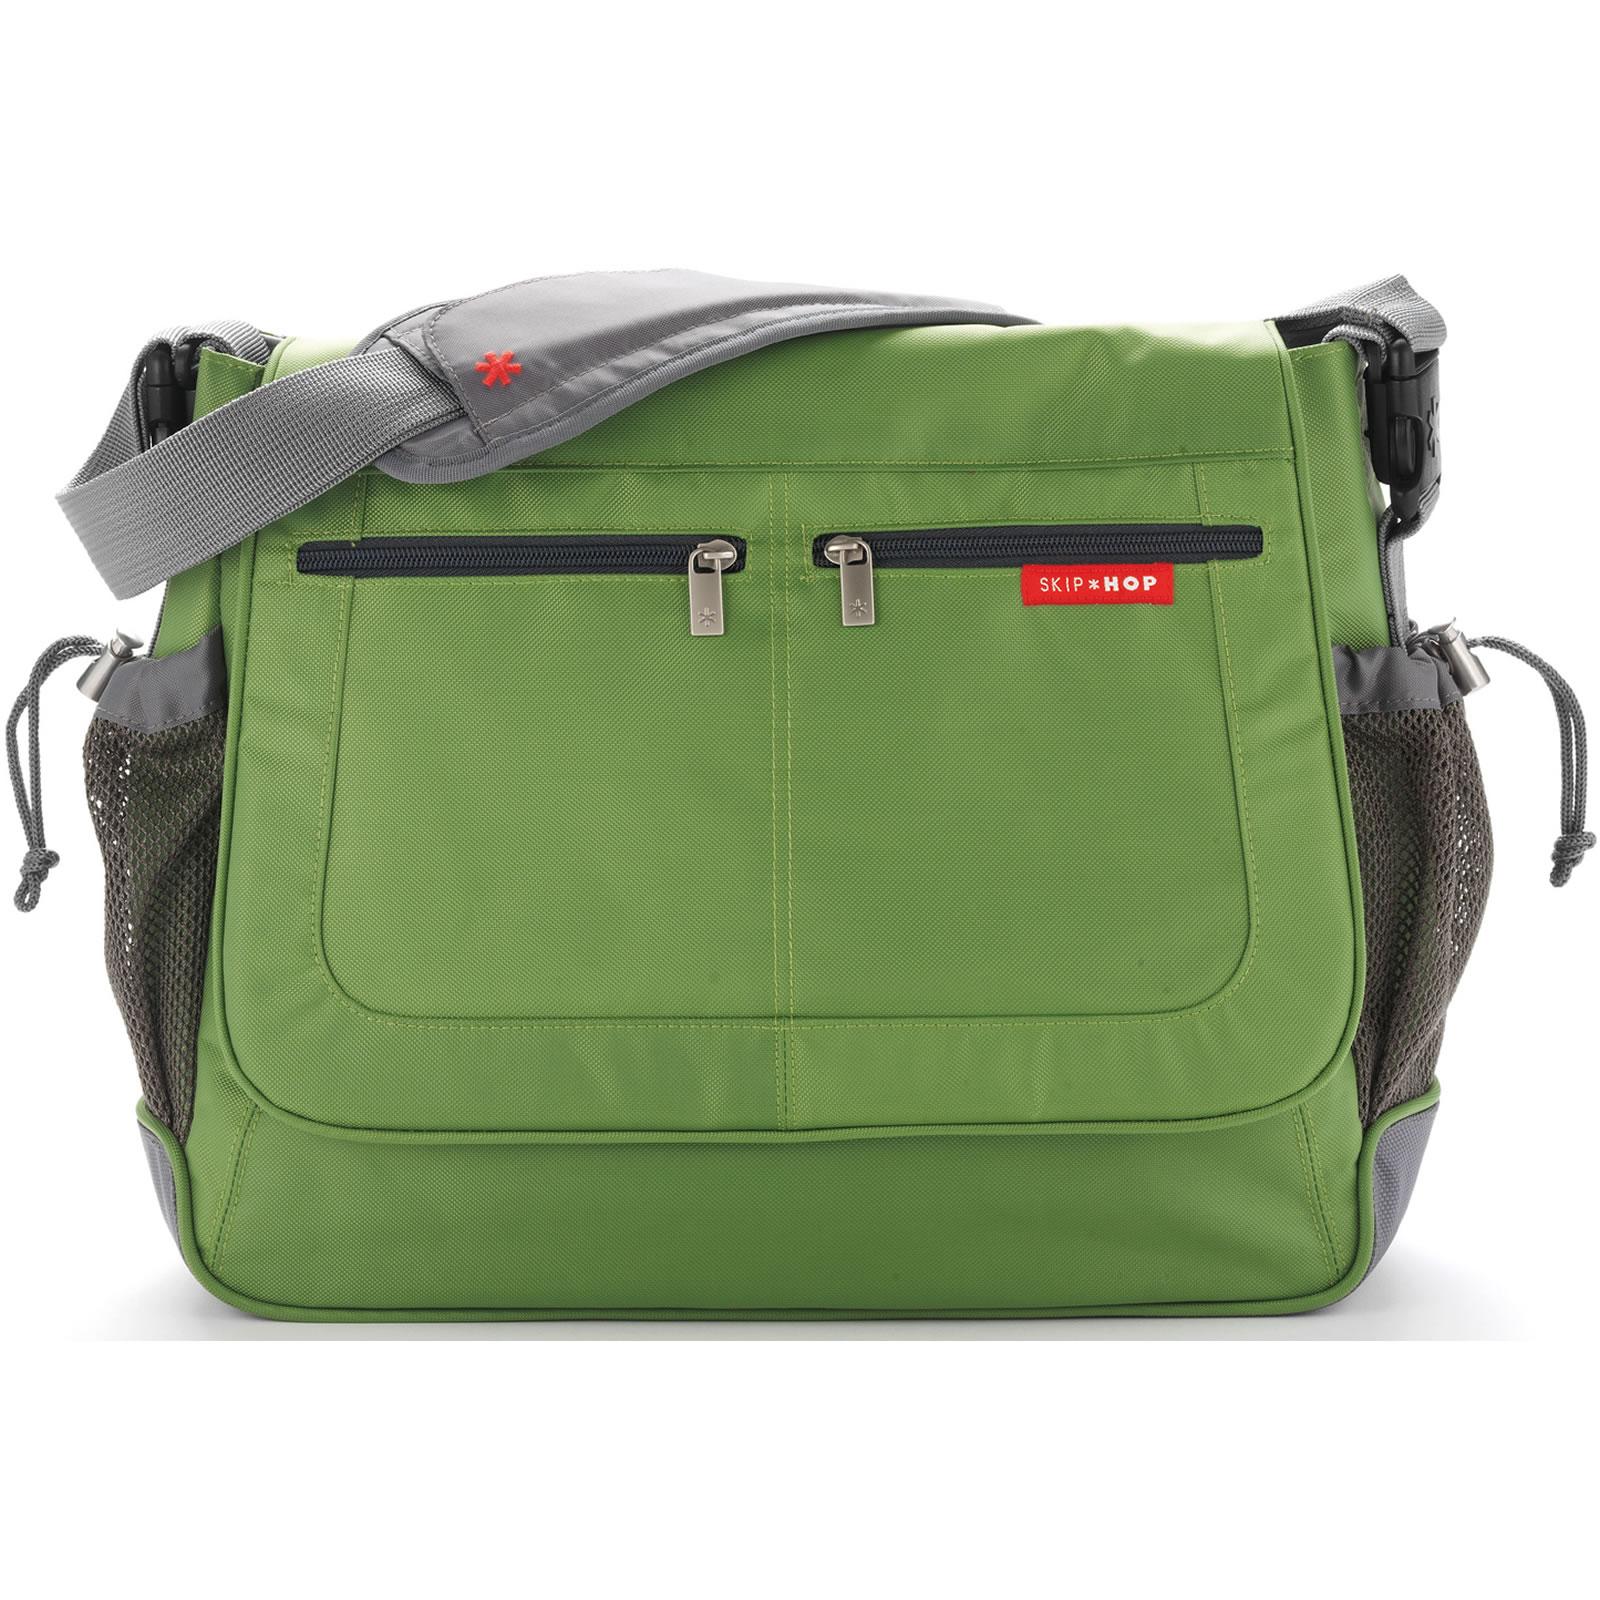 Skip Hop Skip Hop Via Messenger Diaper Bag - Lime